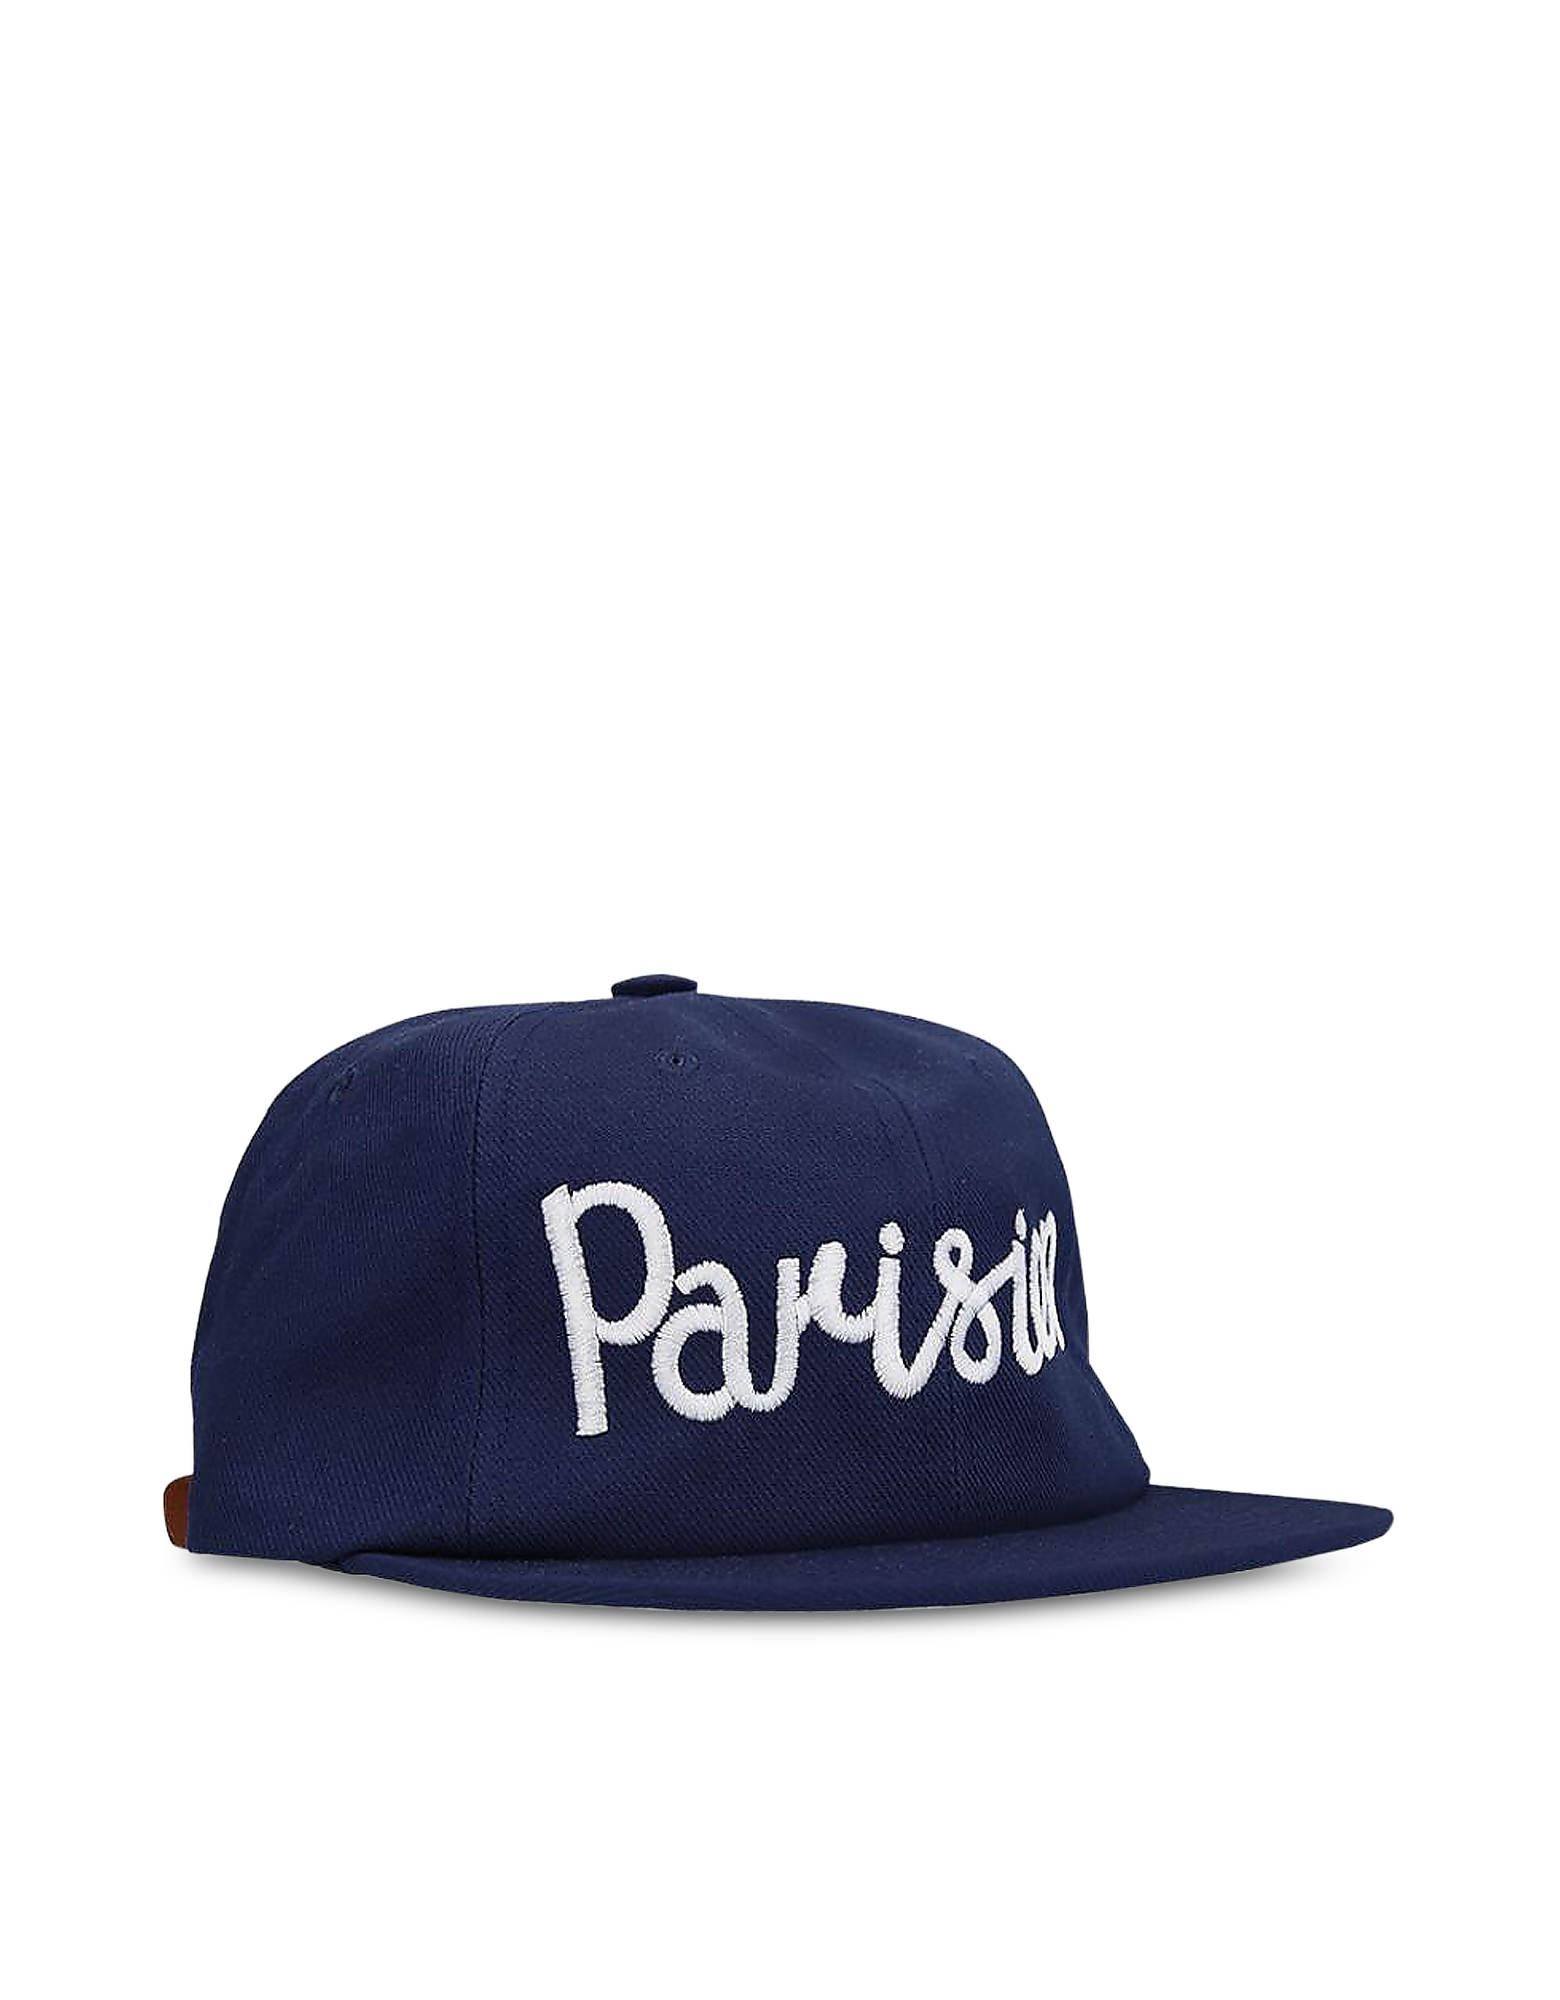 Parisian Embroidered Navy Blue Cotton Blend Baseball Cap